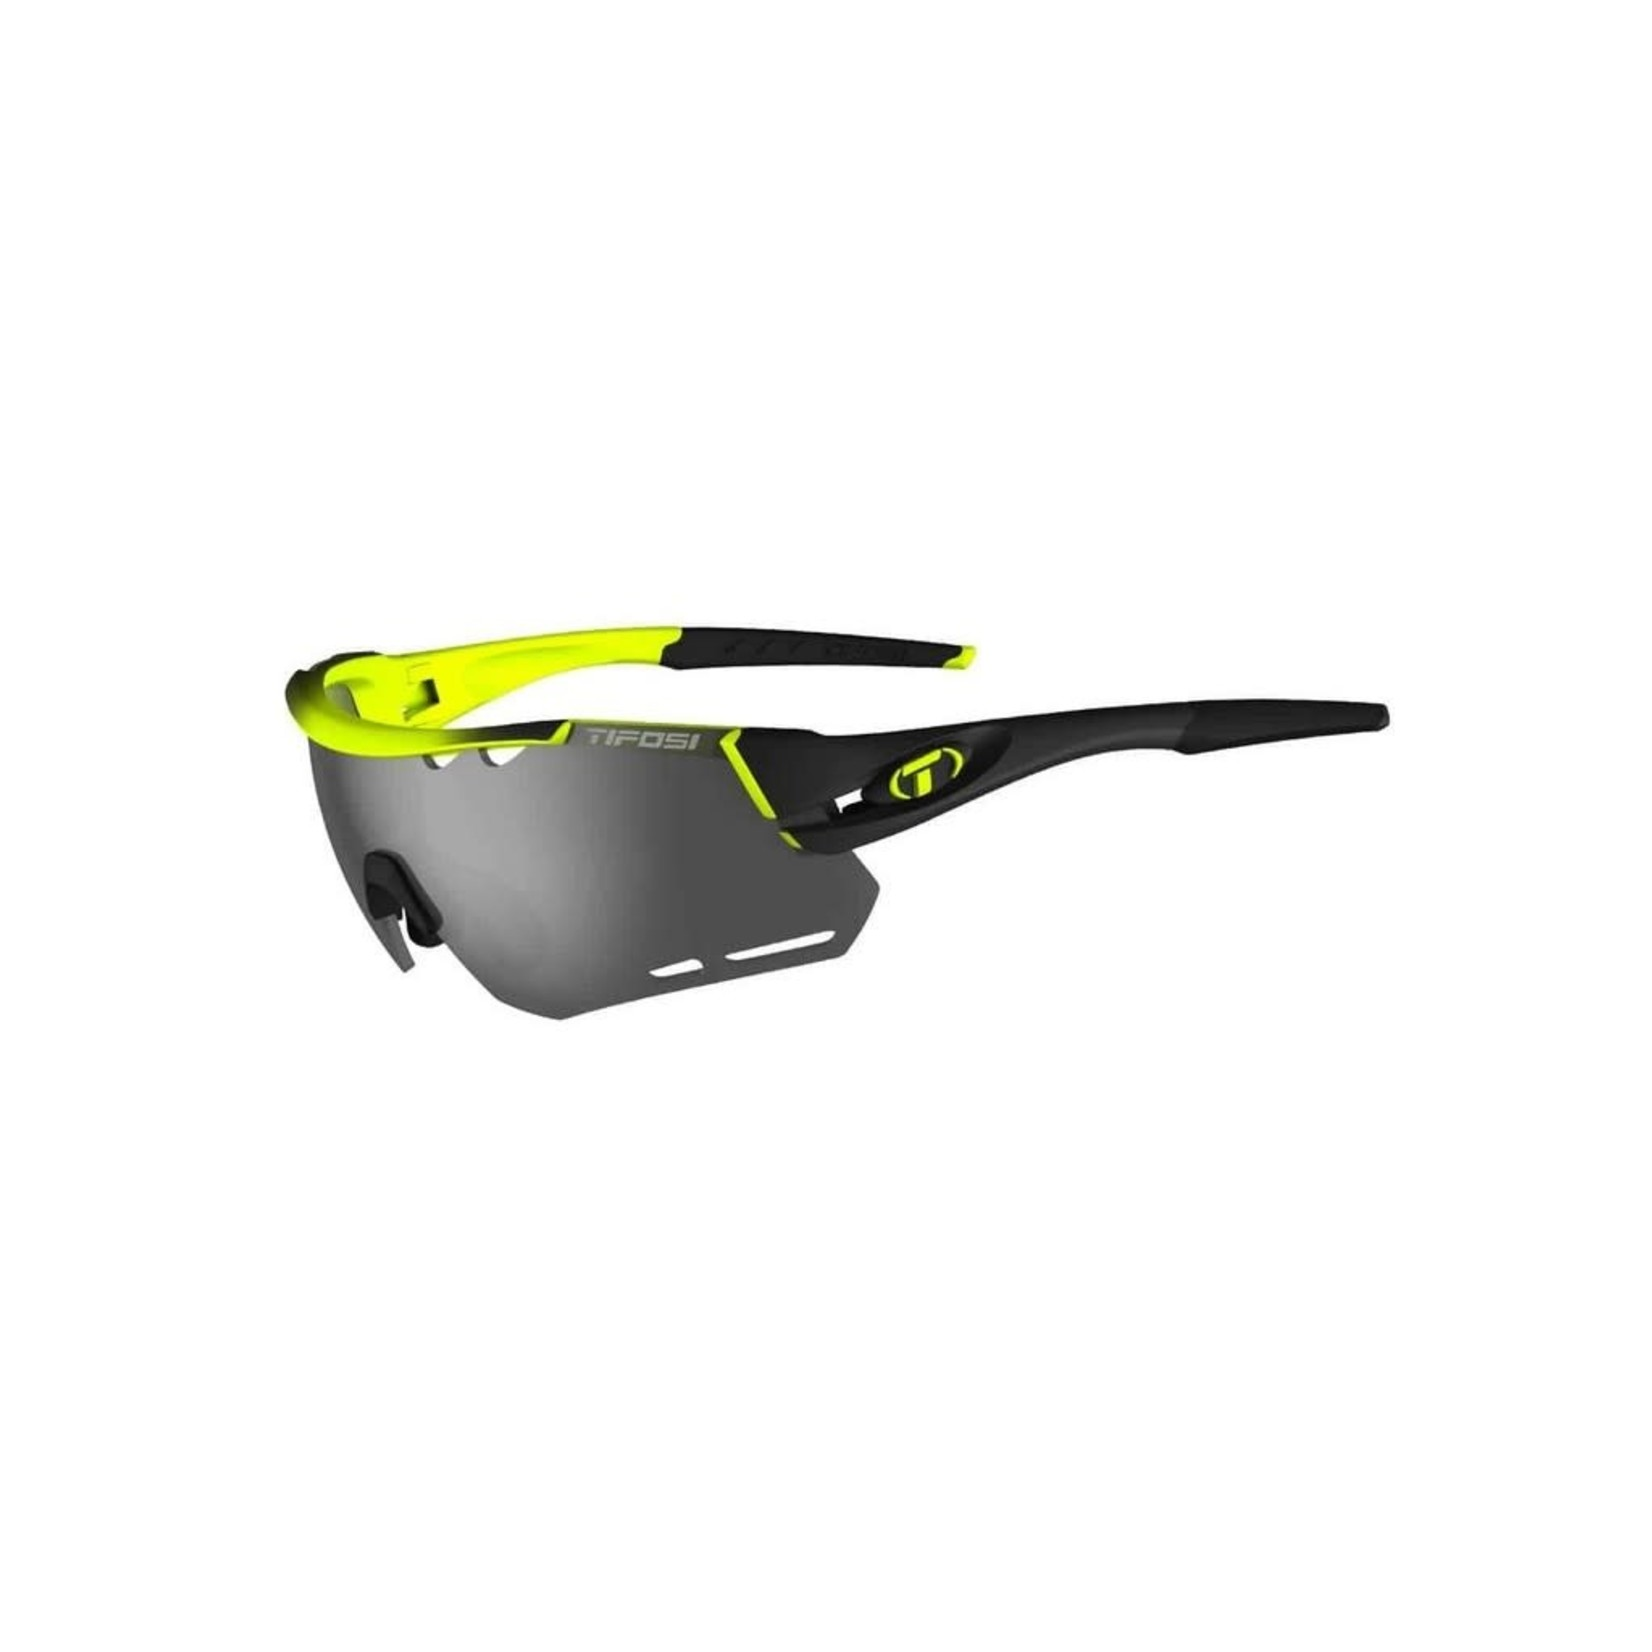 TIFOSI OPTICS Sunglasses Tifosi Alliant Race Neon